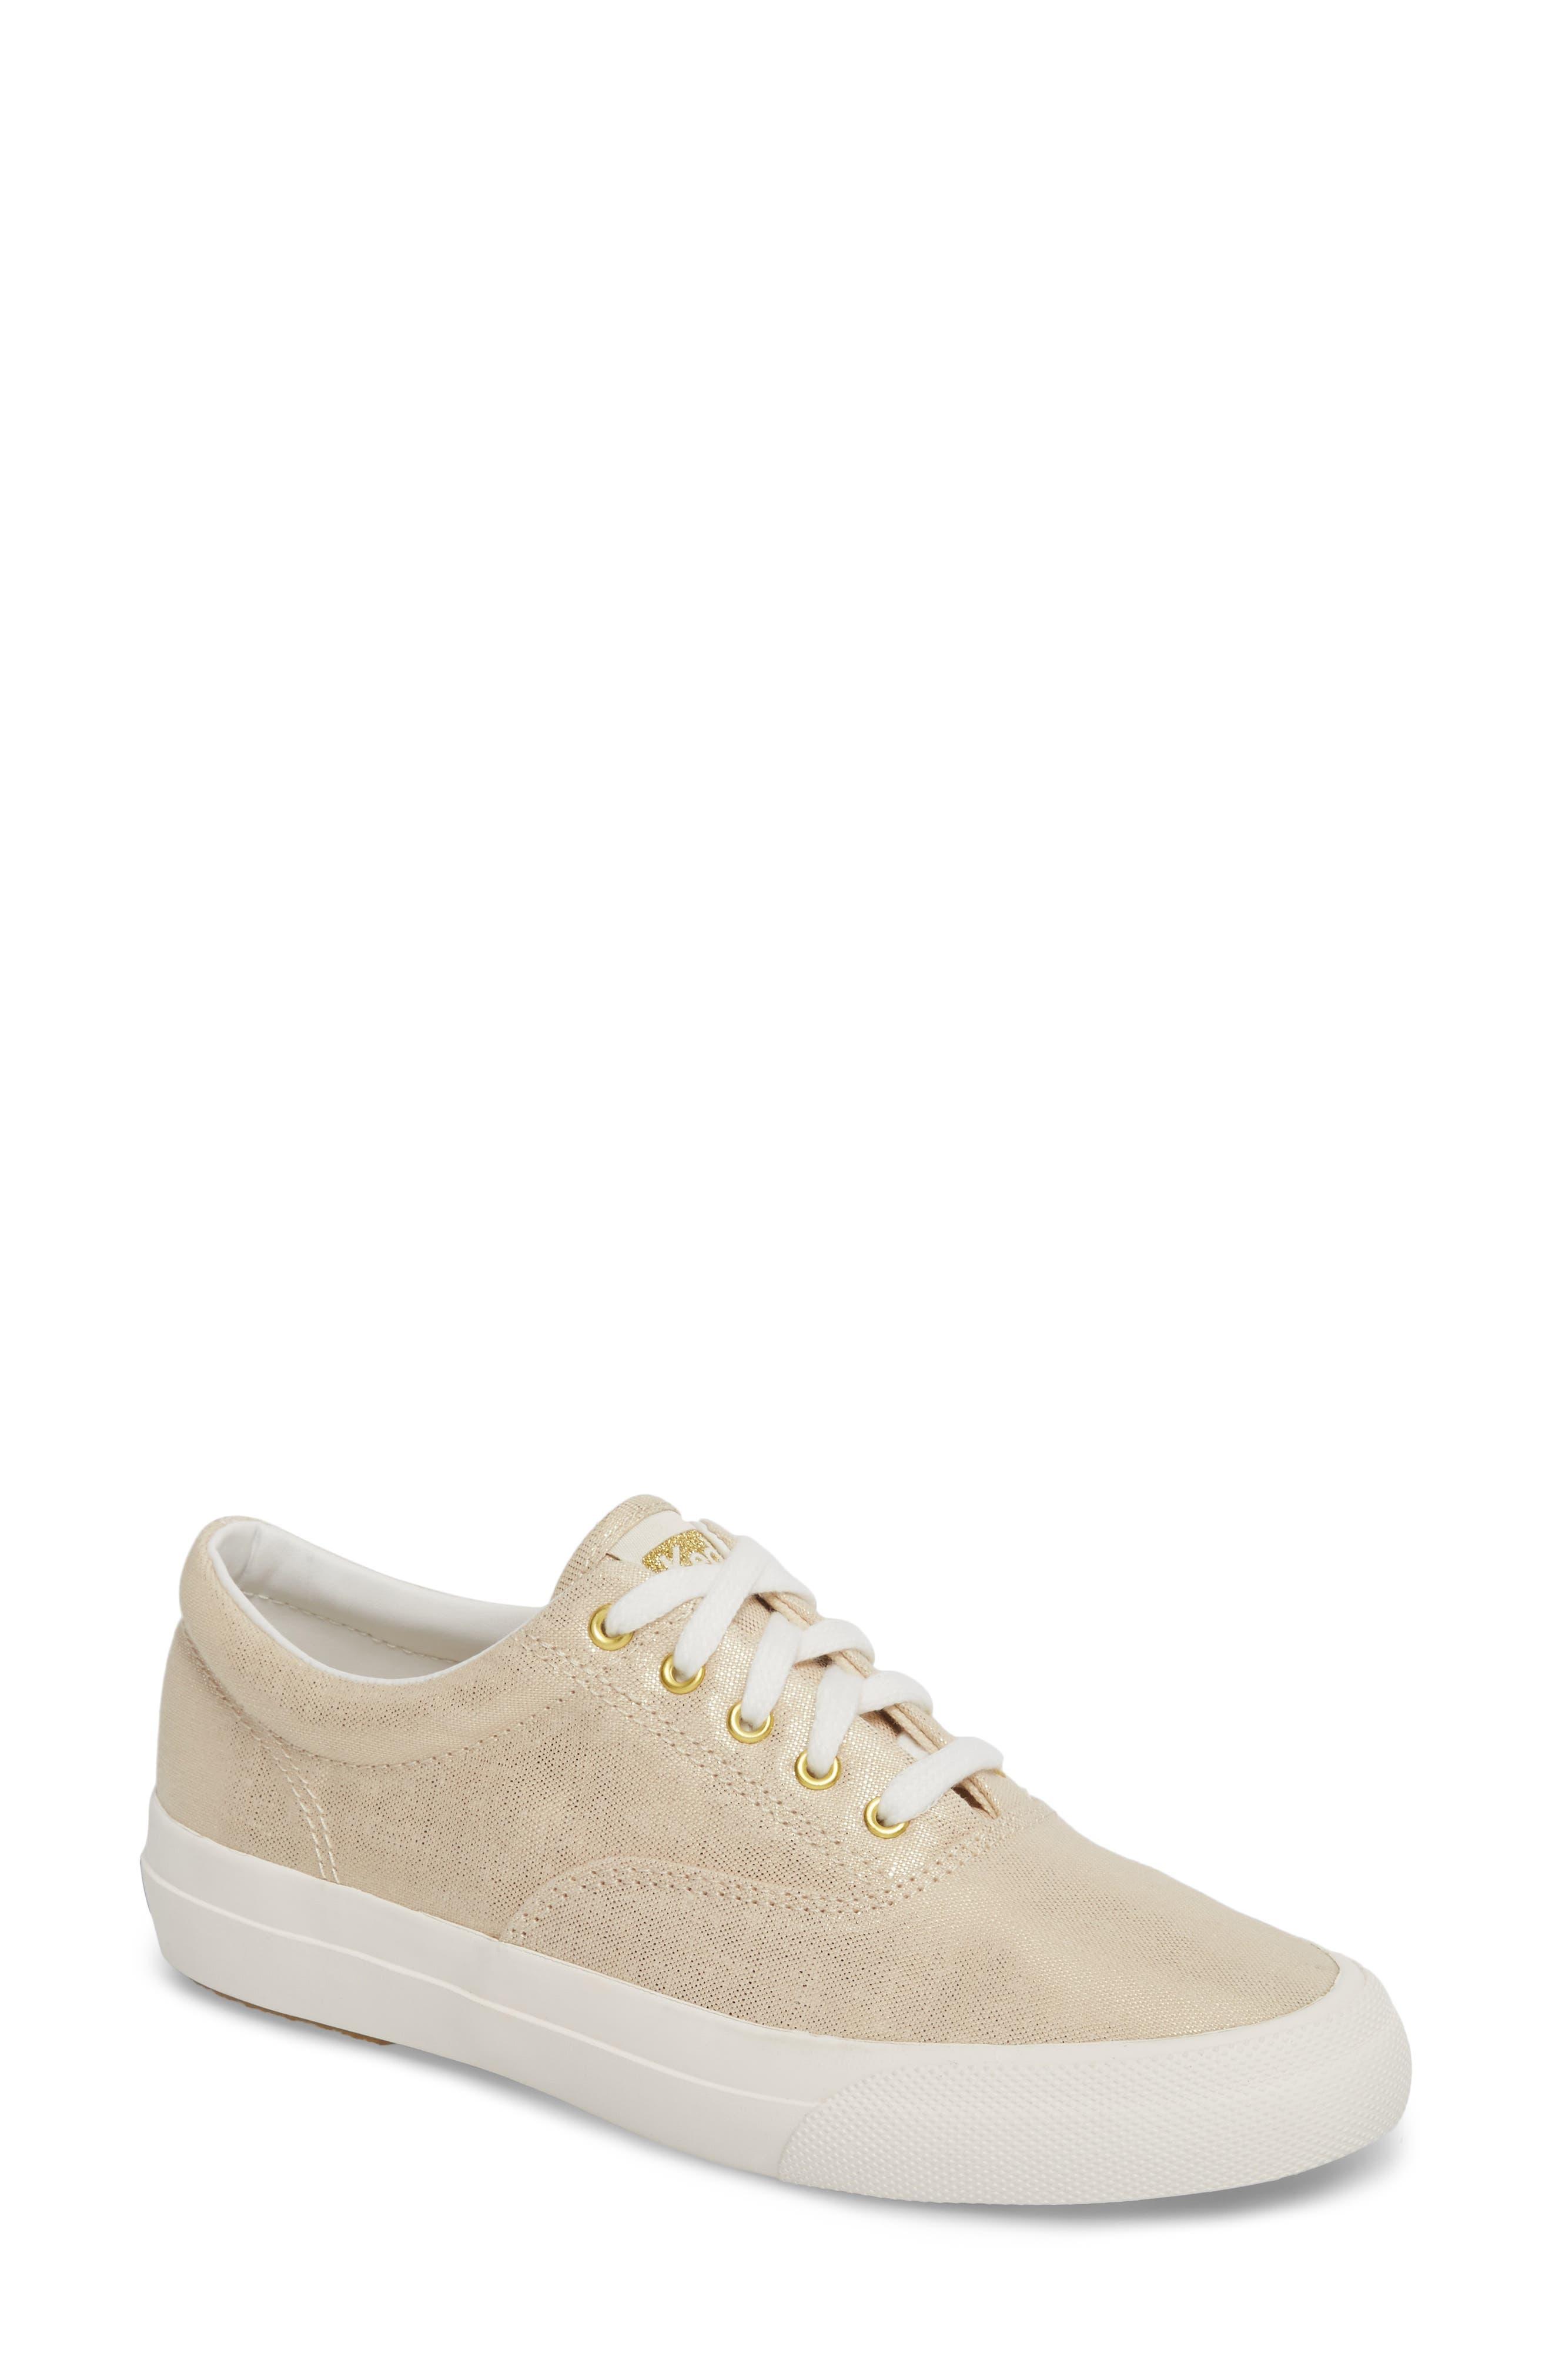 Alternate Image 1 Selected - Keds® Anchor Metallic Linen Sneaker (Women)